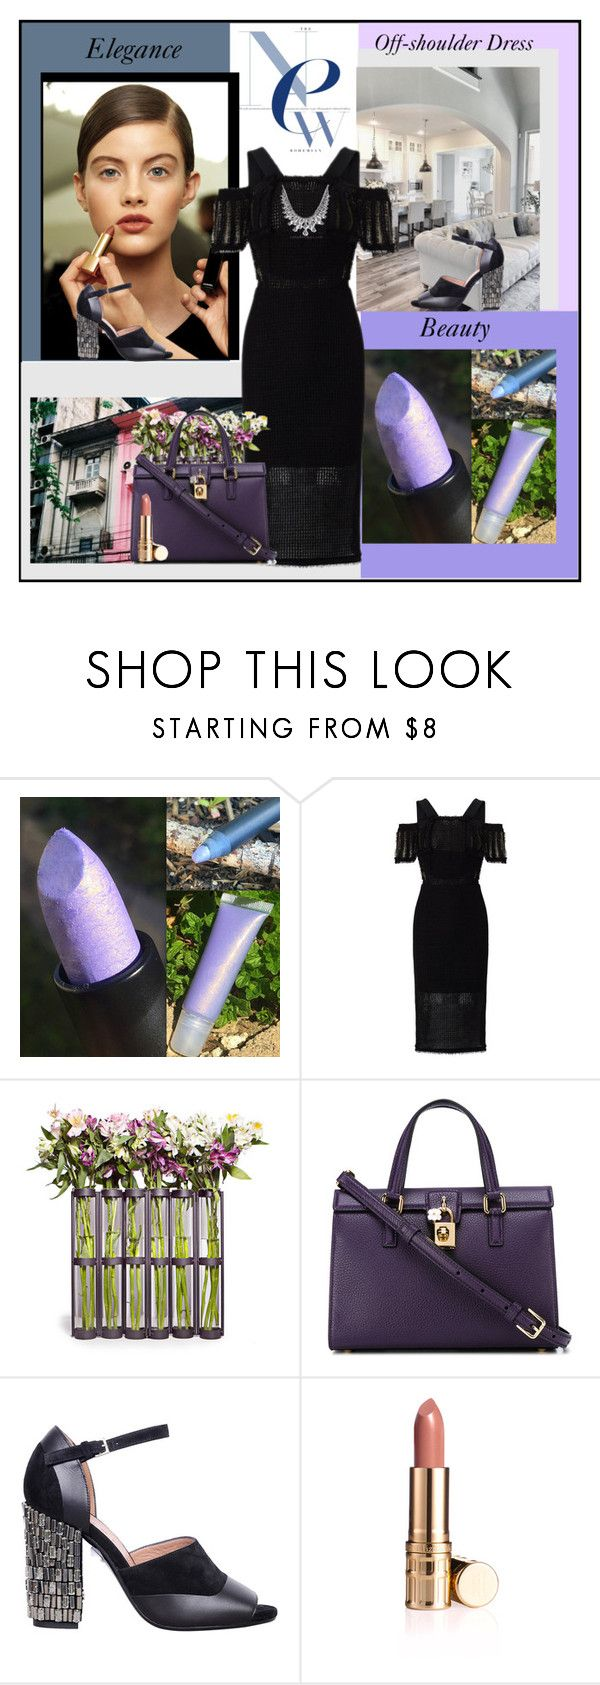 """Off-Shoulder Dress"" by fantasy-rose ❤ liked on Polyvore featuring Chanel, Roland Mouret, Danya B, Dolce&Gabbana, Marni, blackdress and offshoulderdress"